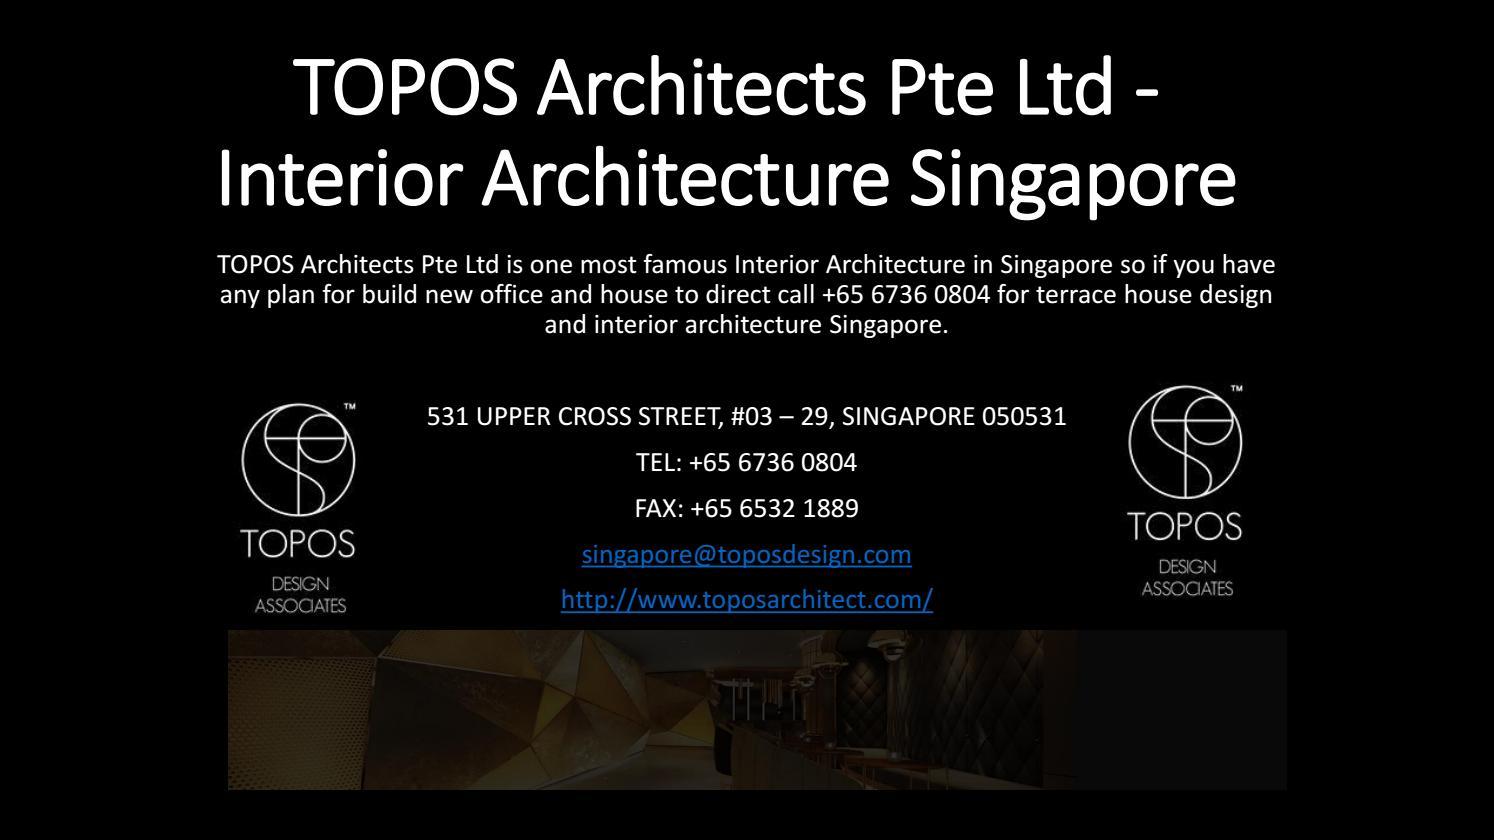 Topos architects pte ltd interior architecture singapore by TOPOS